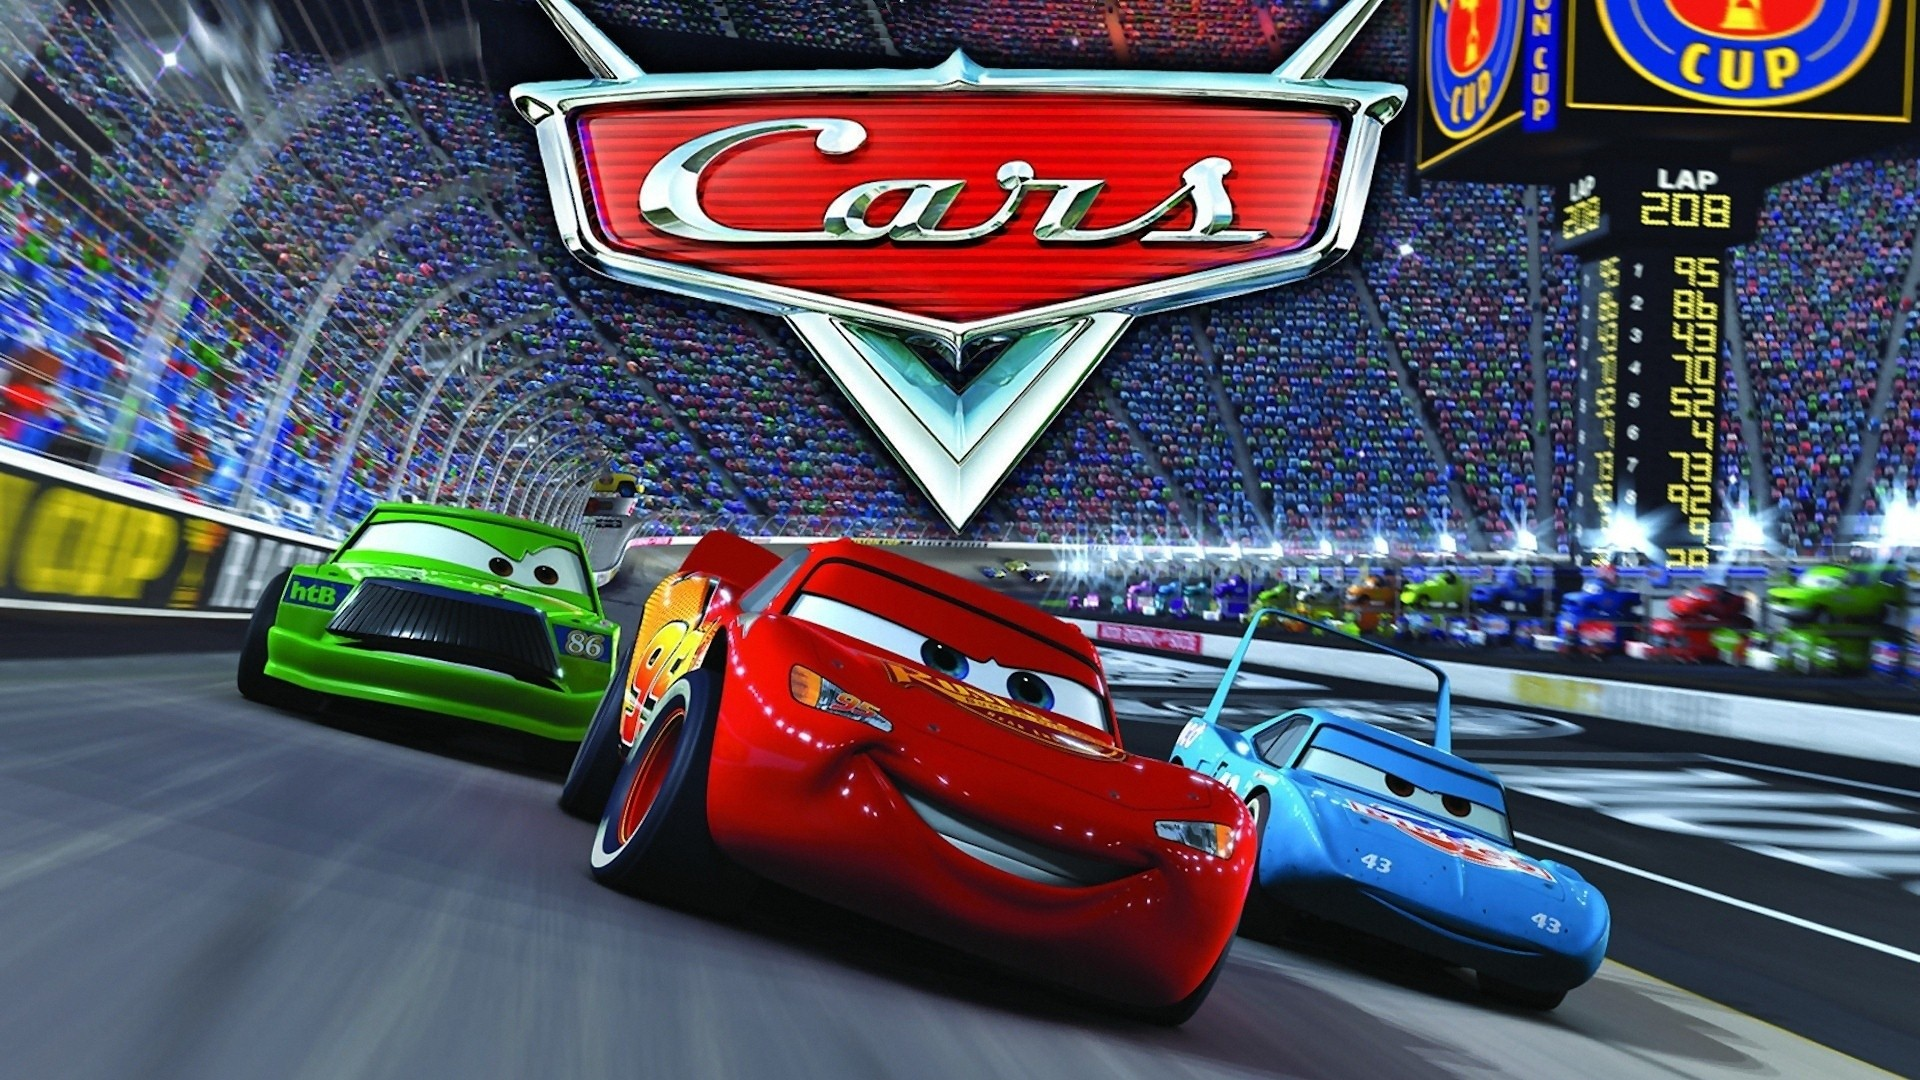 Tow Mater Cars Movie Wallpaper 1920x1200 Wallpaper Cars Cartoon 62 Images